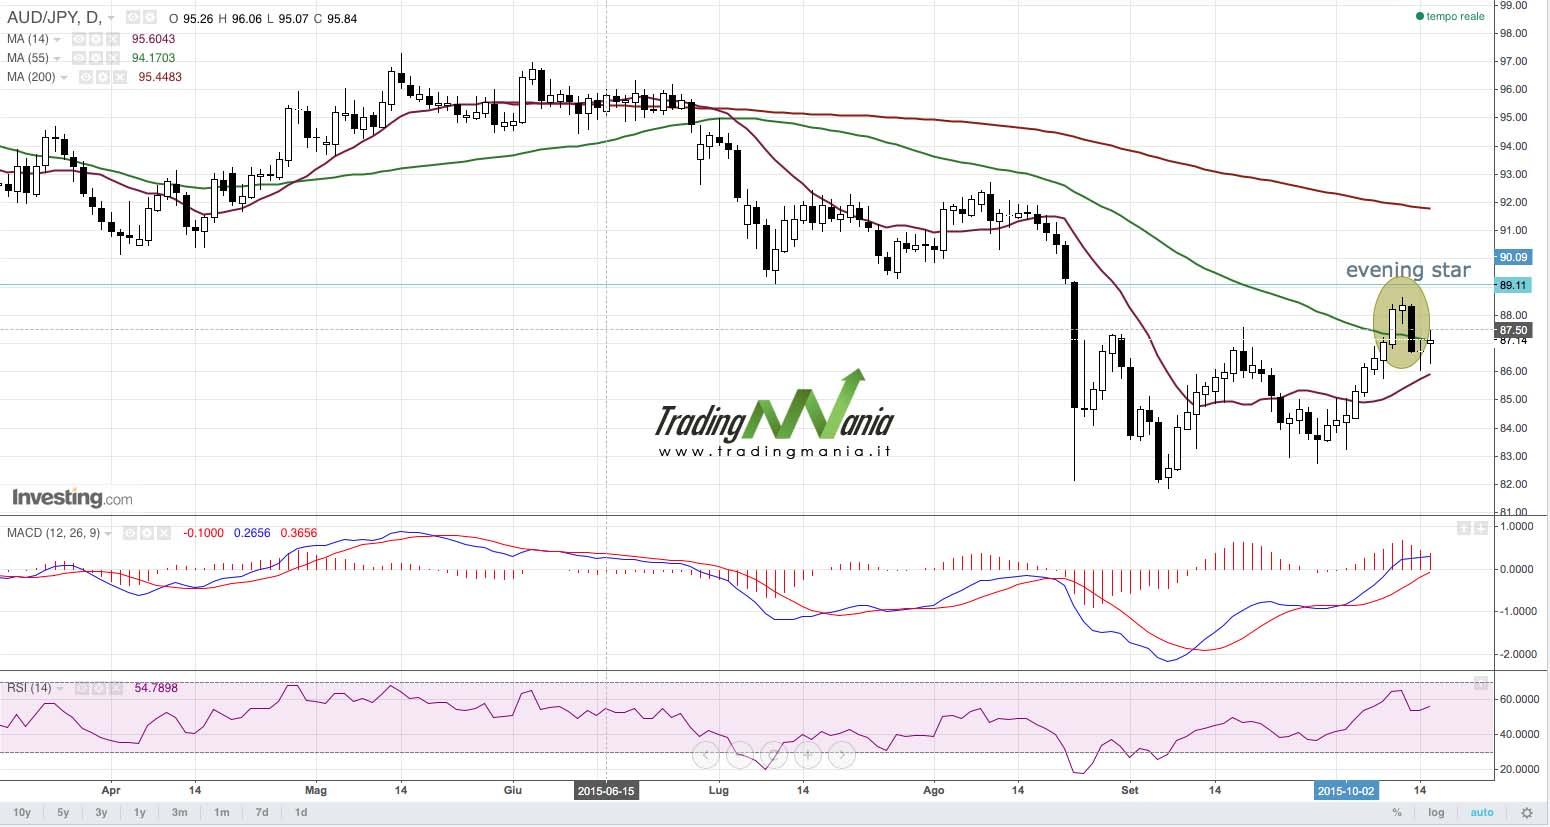 Strategia di trading online su Forex AUDJPY